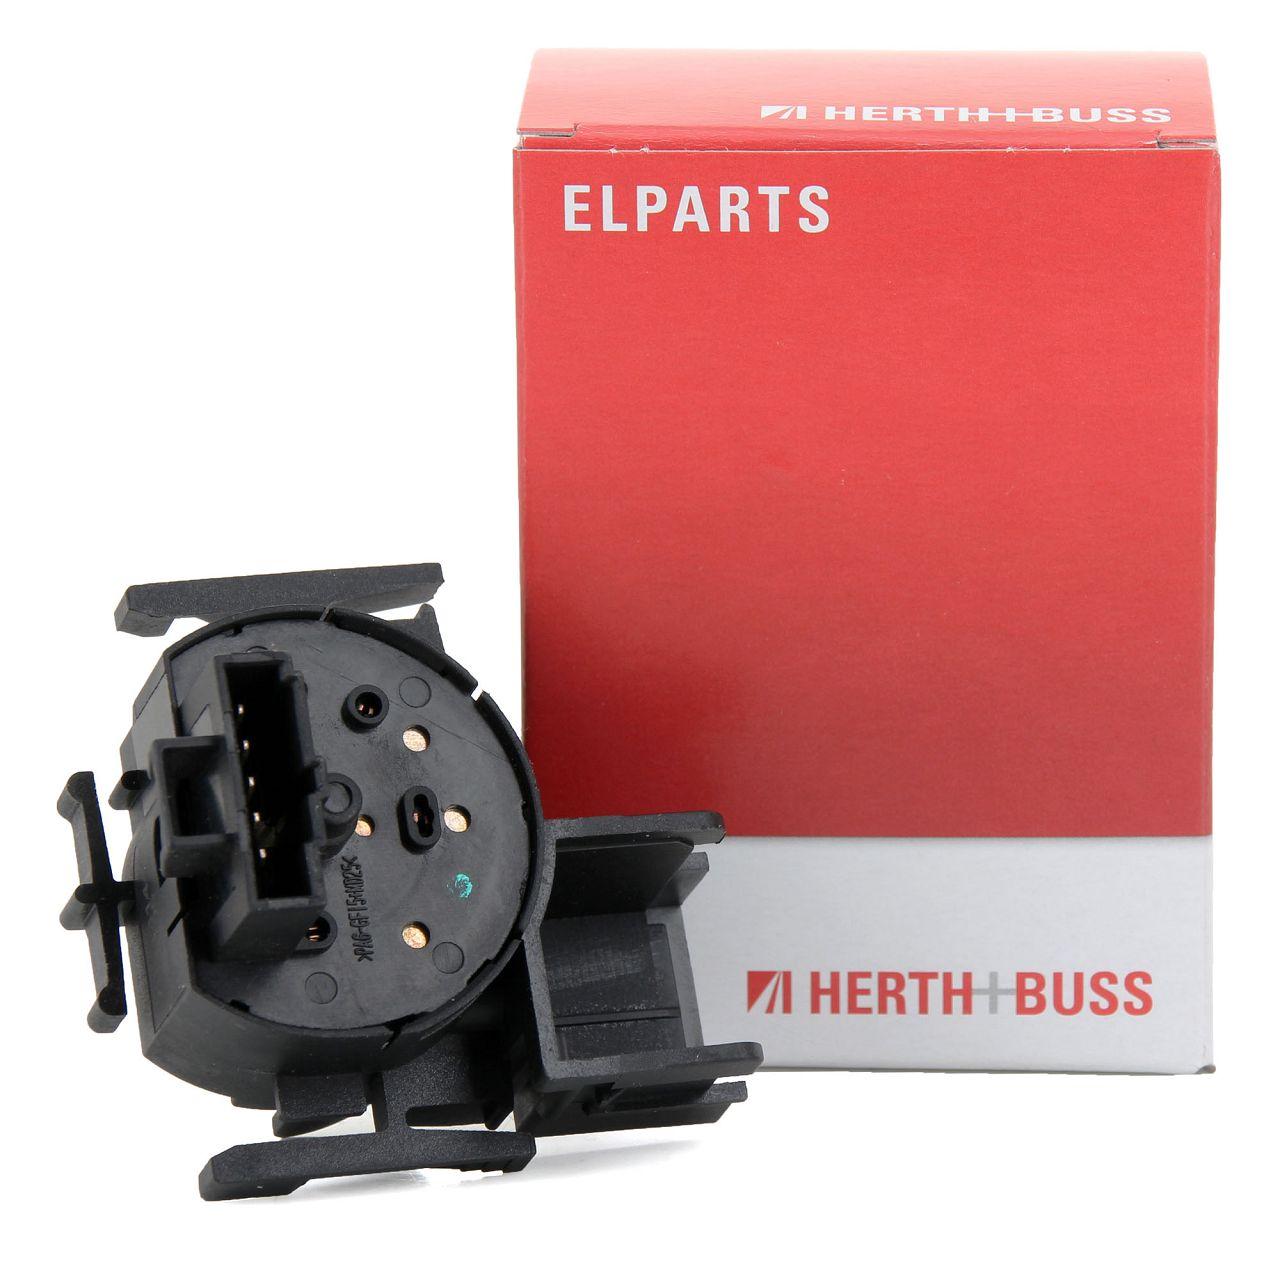 HERTH+BUSS ELPARTS Zündschalter 70513144 für Opel Combo Corsa C Meriva A Tigra A